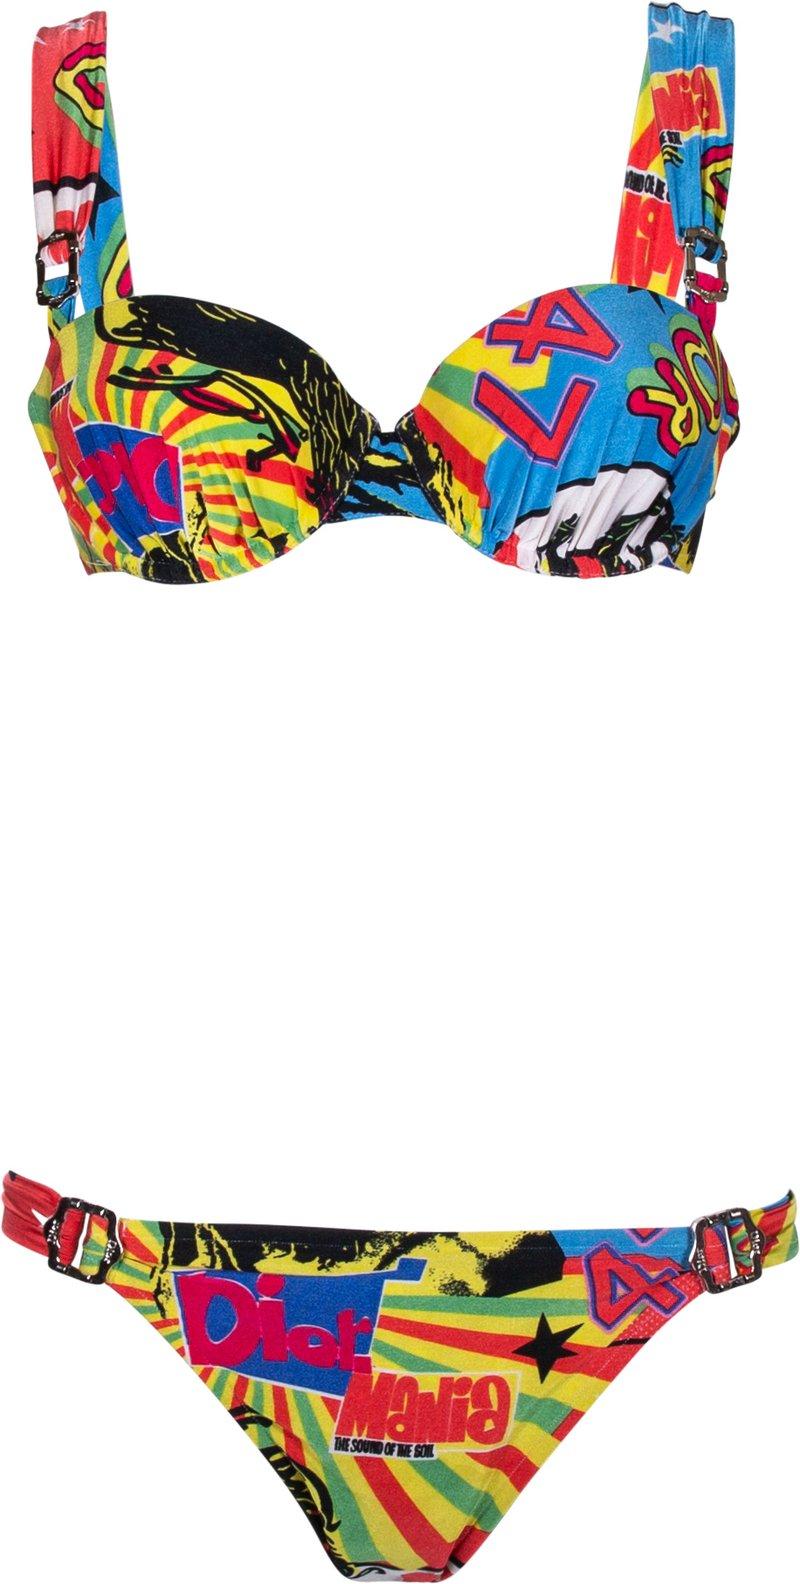 Rasta Bikini Set by Dior, available on tradesy.com for $835 Kourtney Kardashian Top Exact Product